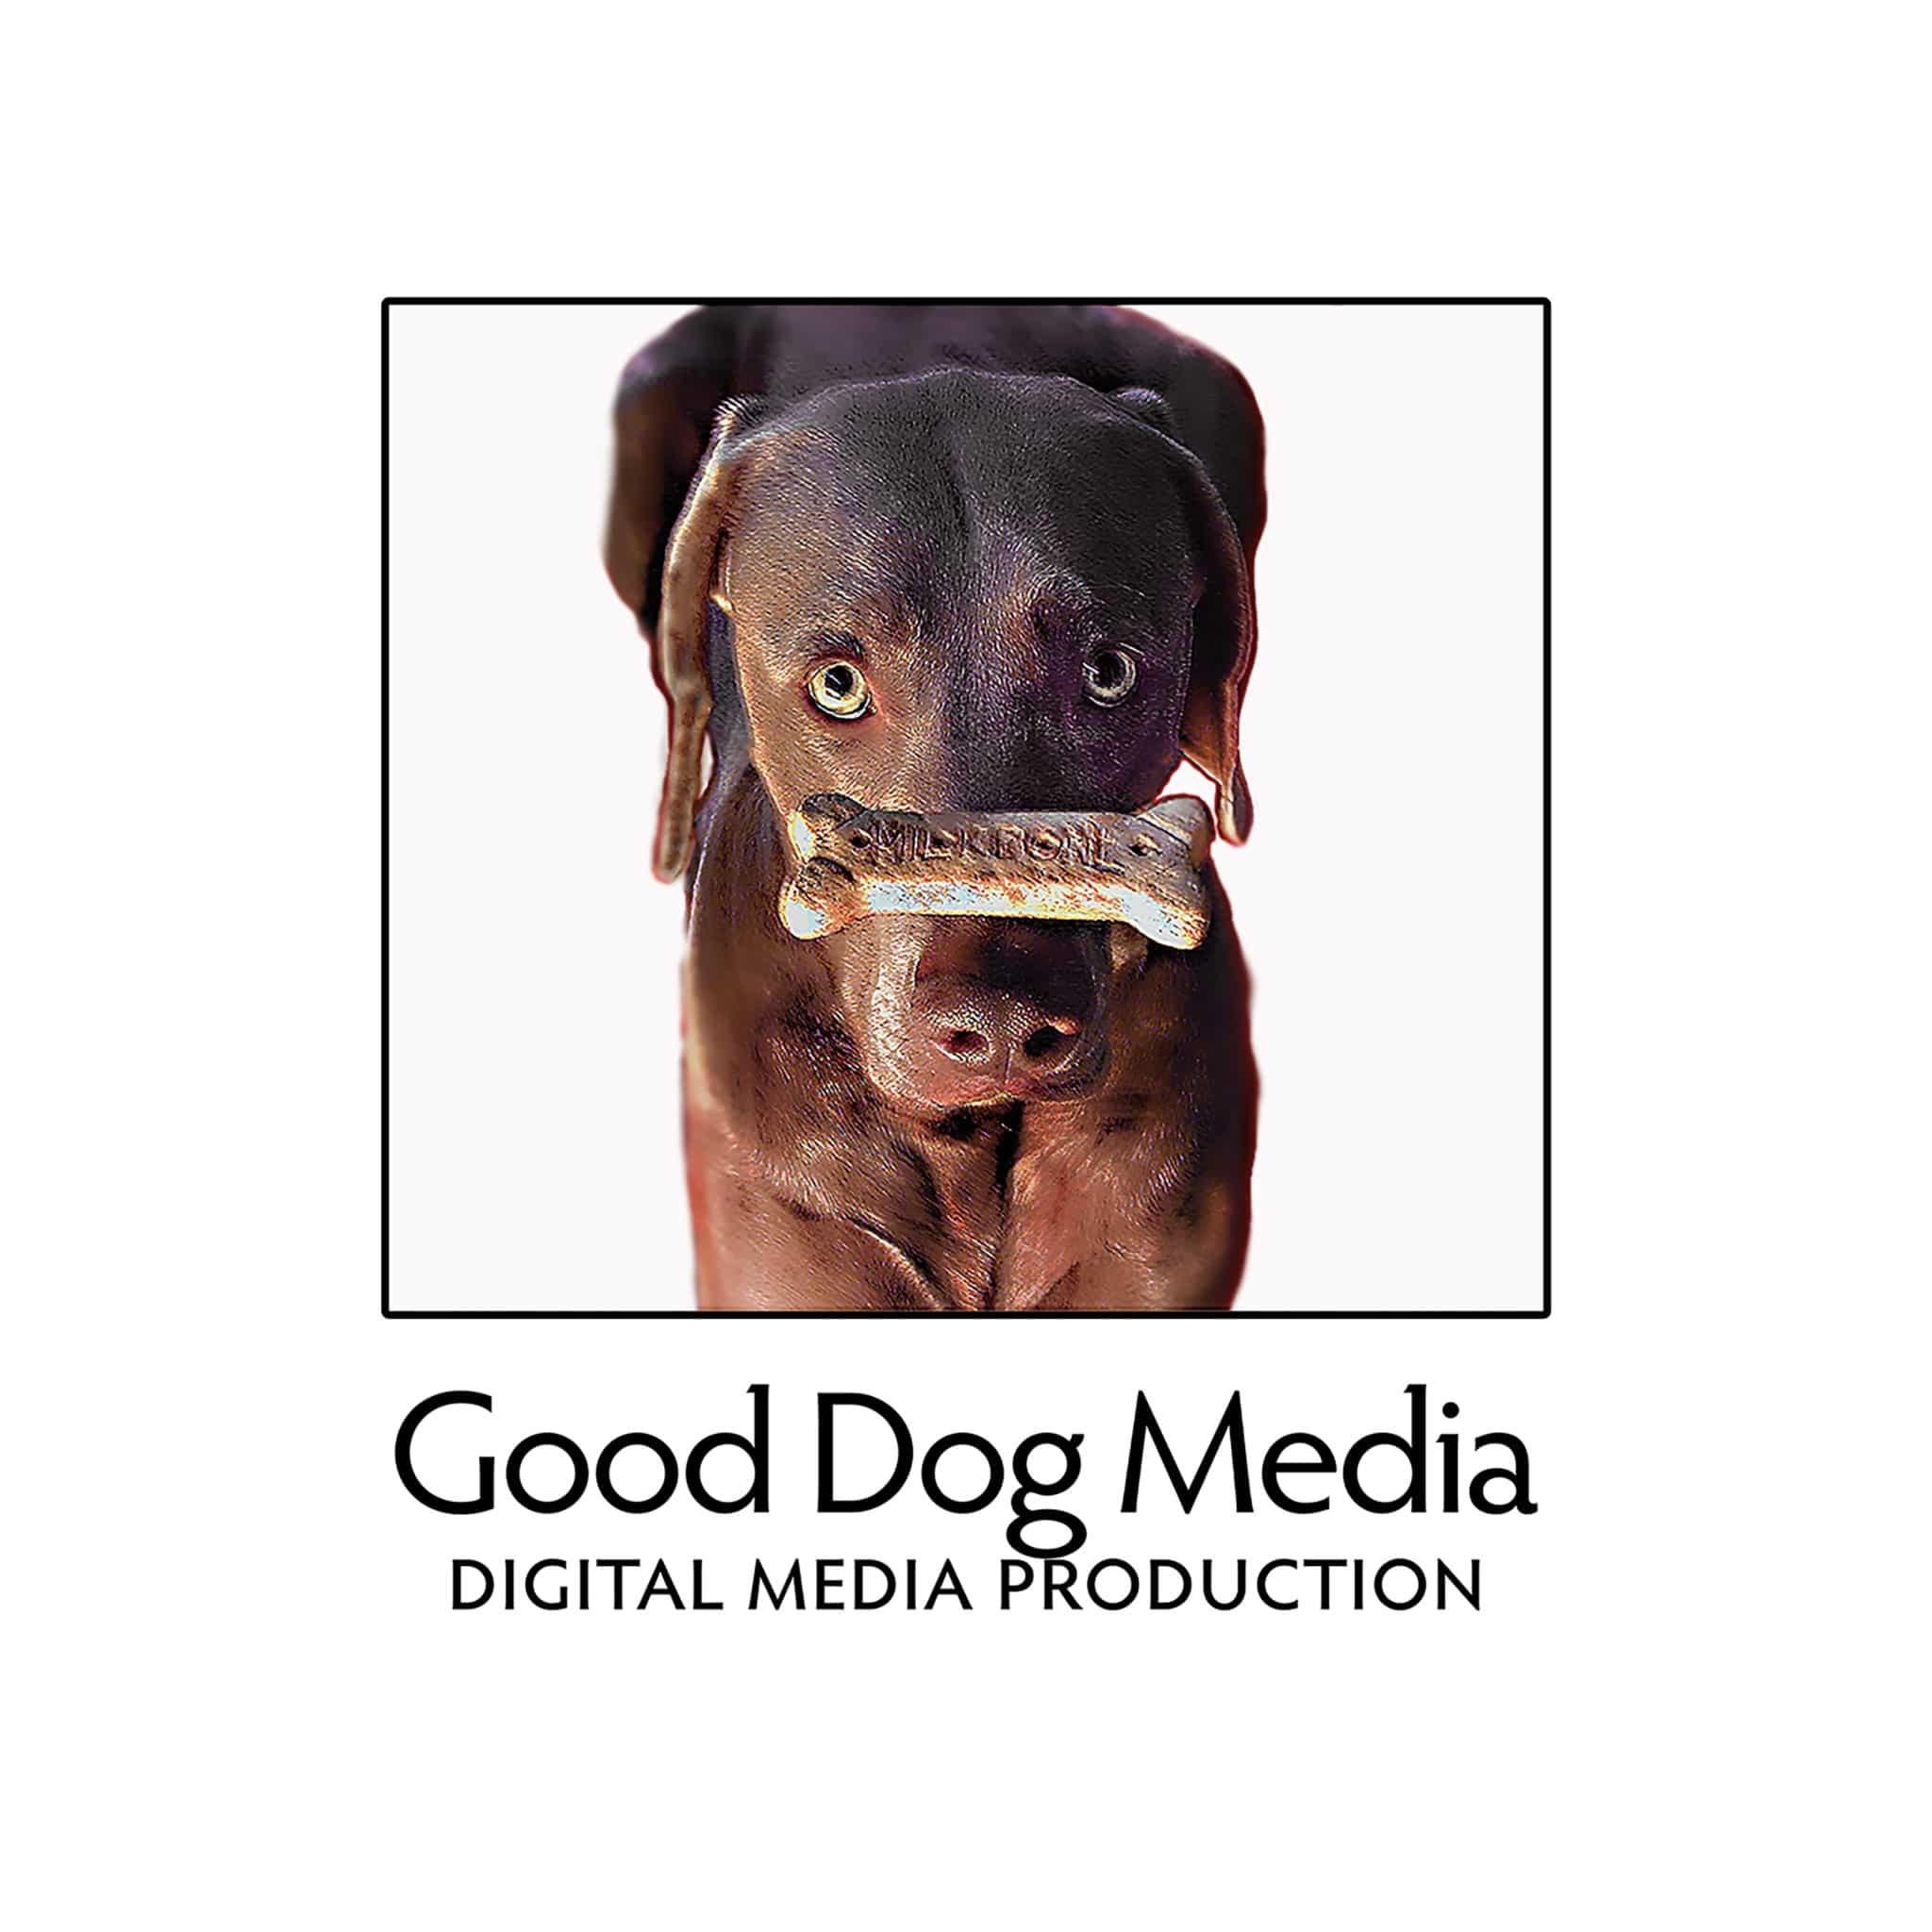 Good Dog Media